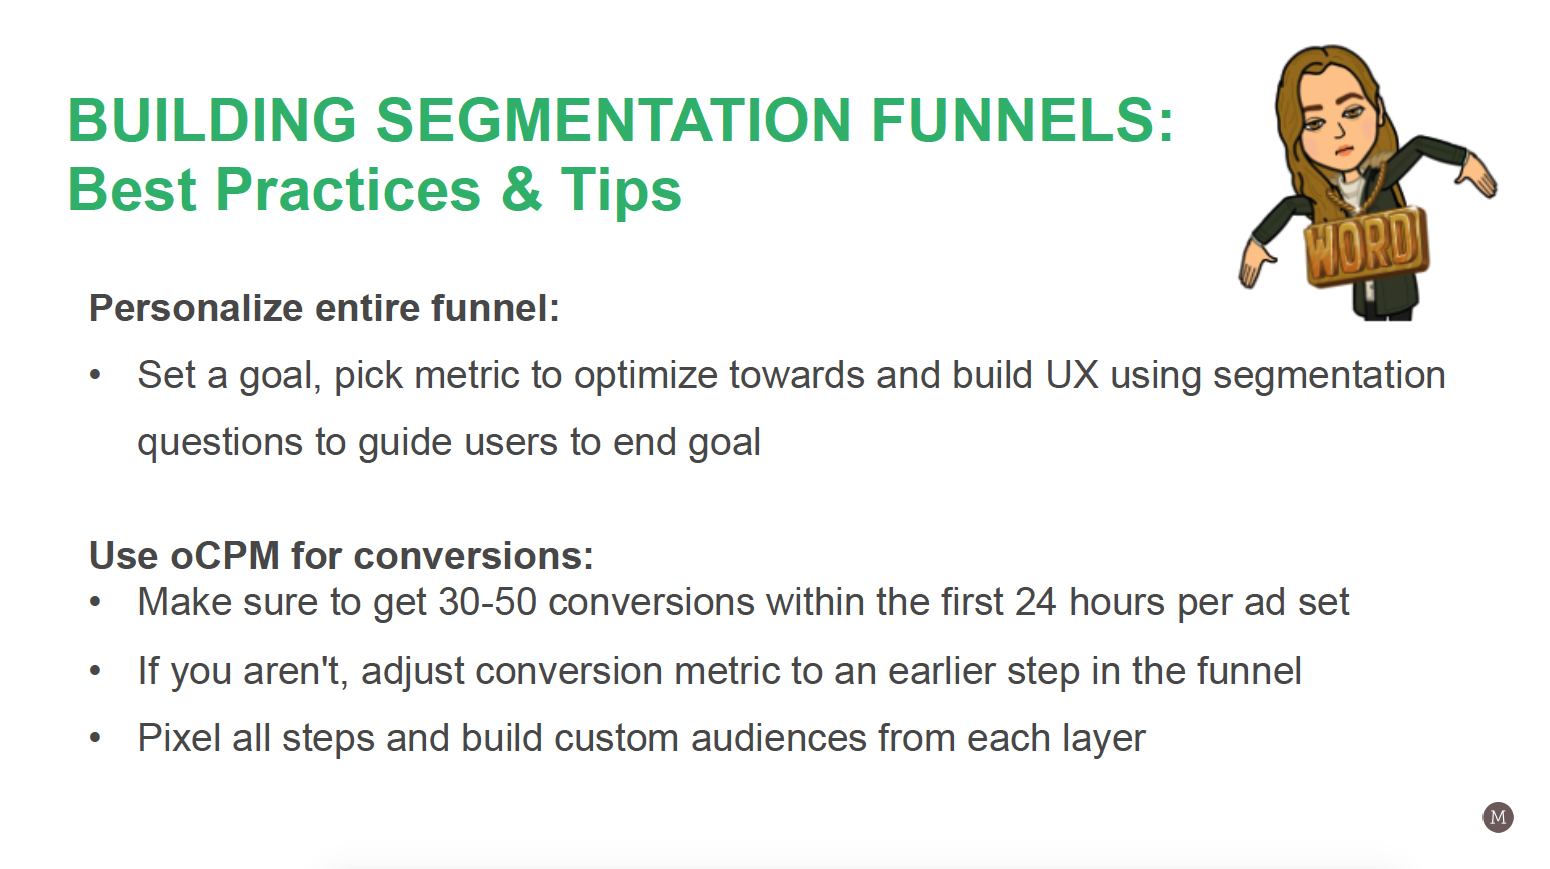 Mirella Crespi – Building Segmentation Funnels - Best Practices and Tips